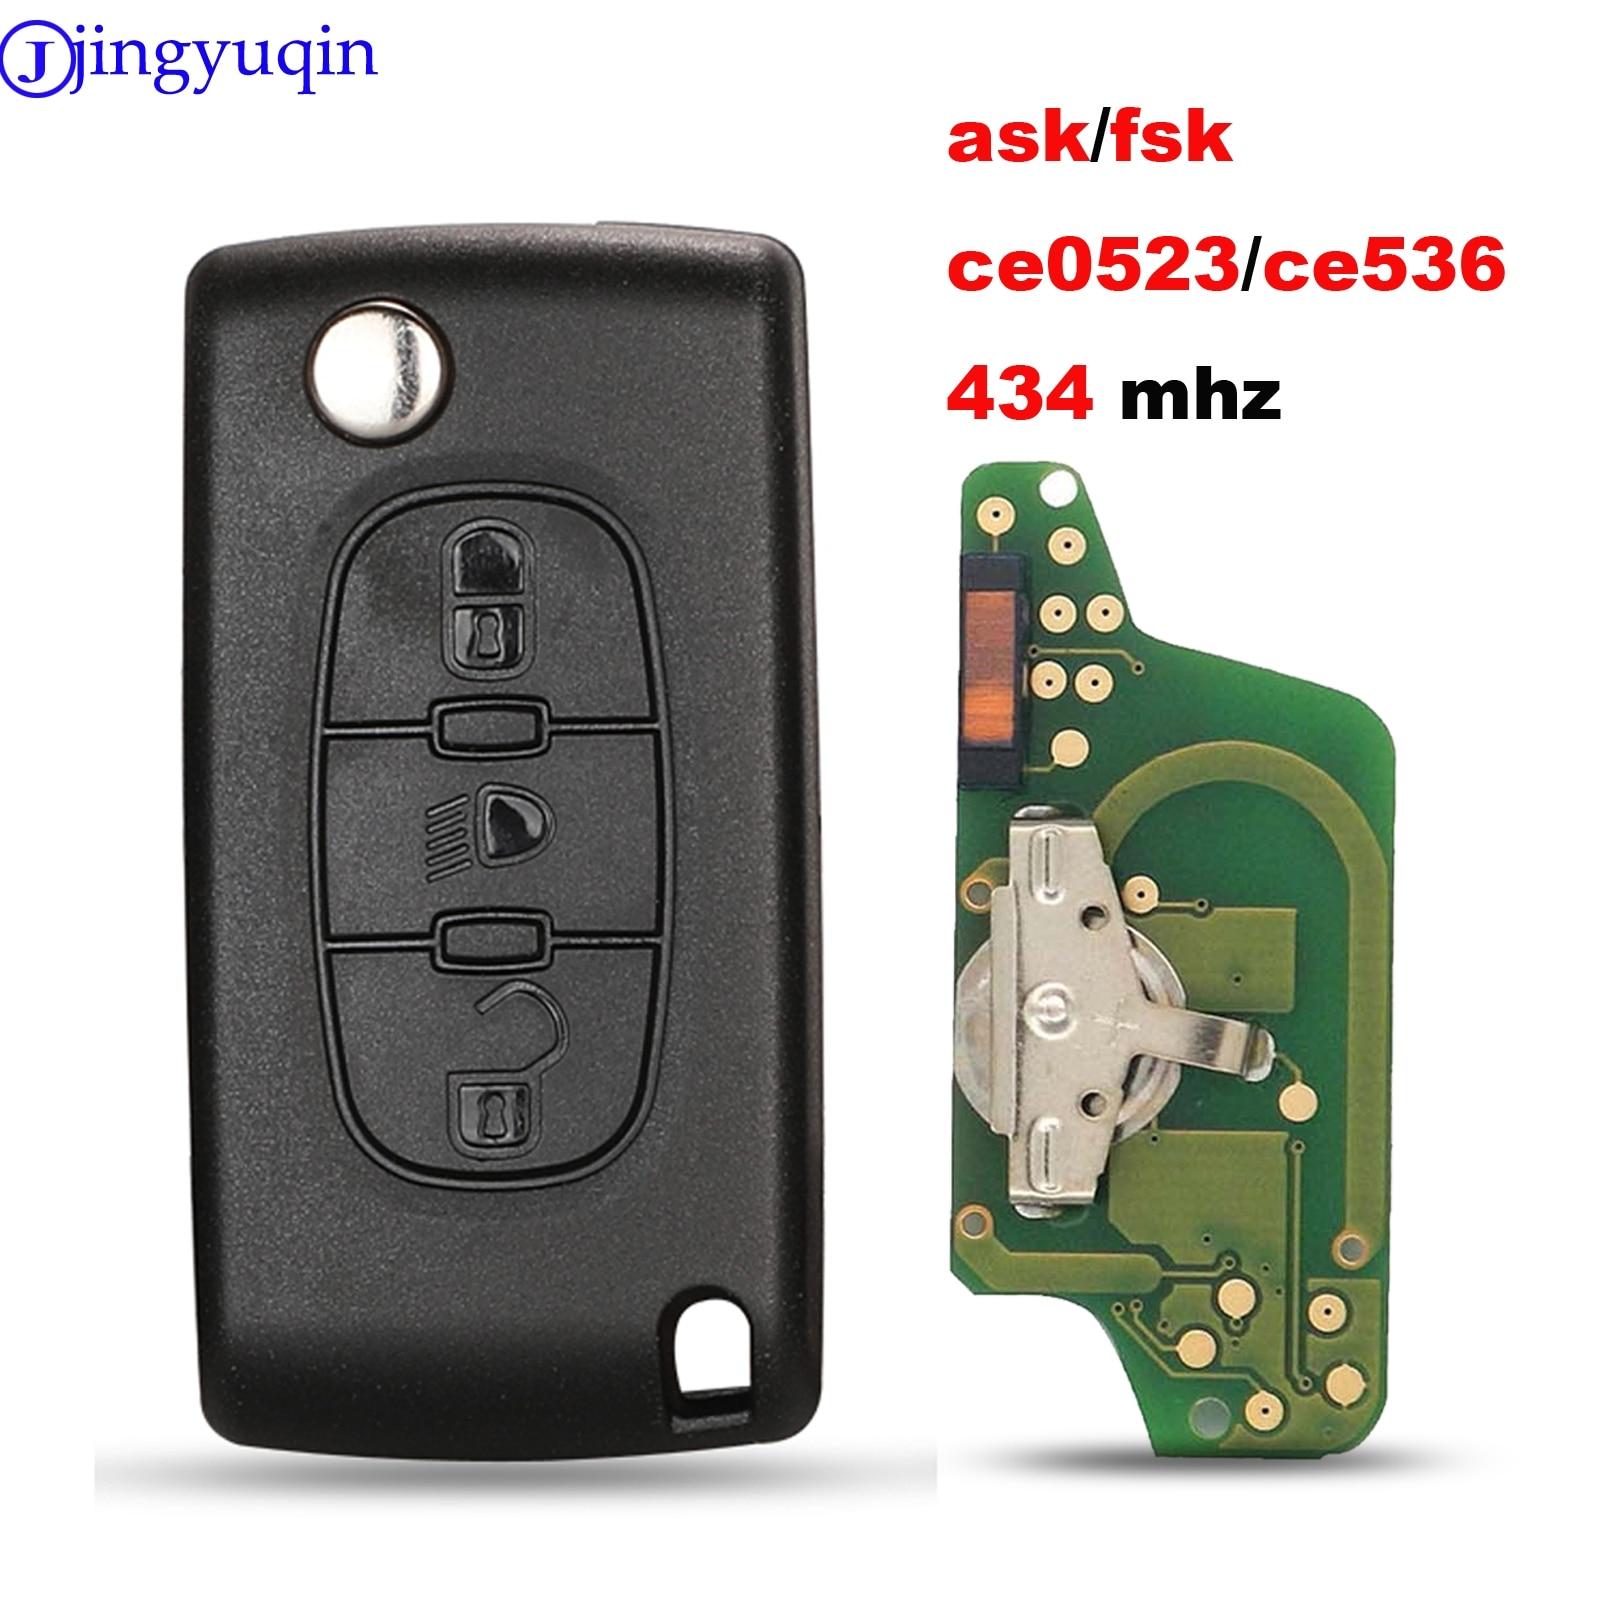 Jingyuqin Ce0523 Ce0536 ASK/FSK 433 МГц ID46 для Peugeot 407 307 308 607 для Citroen C2 C3 C4 C5 C6 C8 Автомобильный ключ VA2/HU83 лезвие